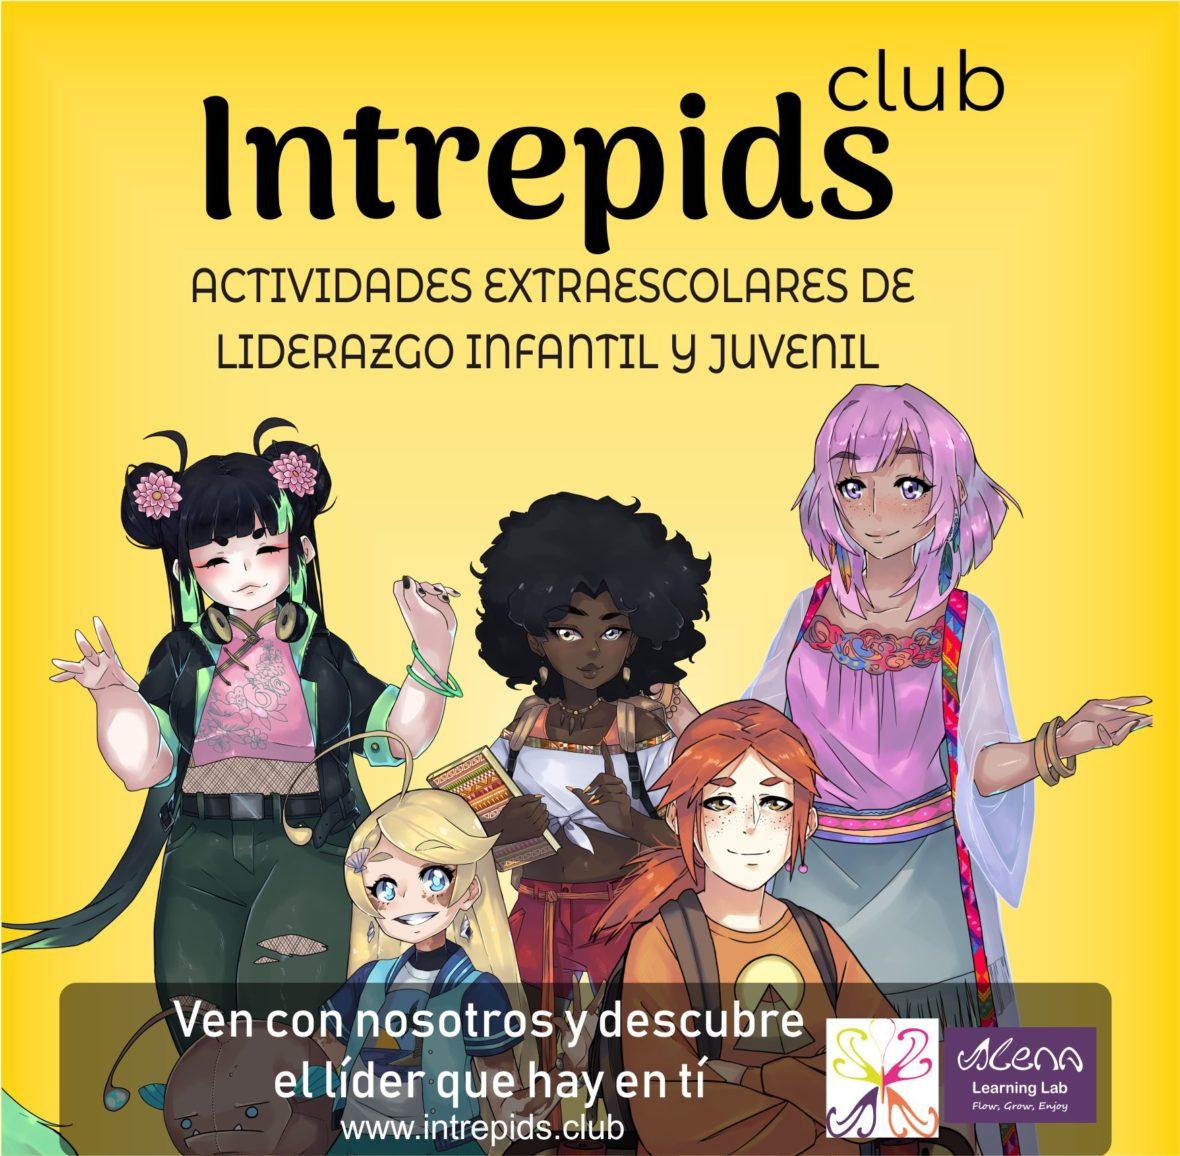 Alena_Intrepids_Extraescolares